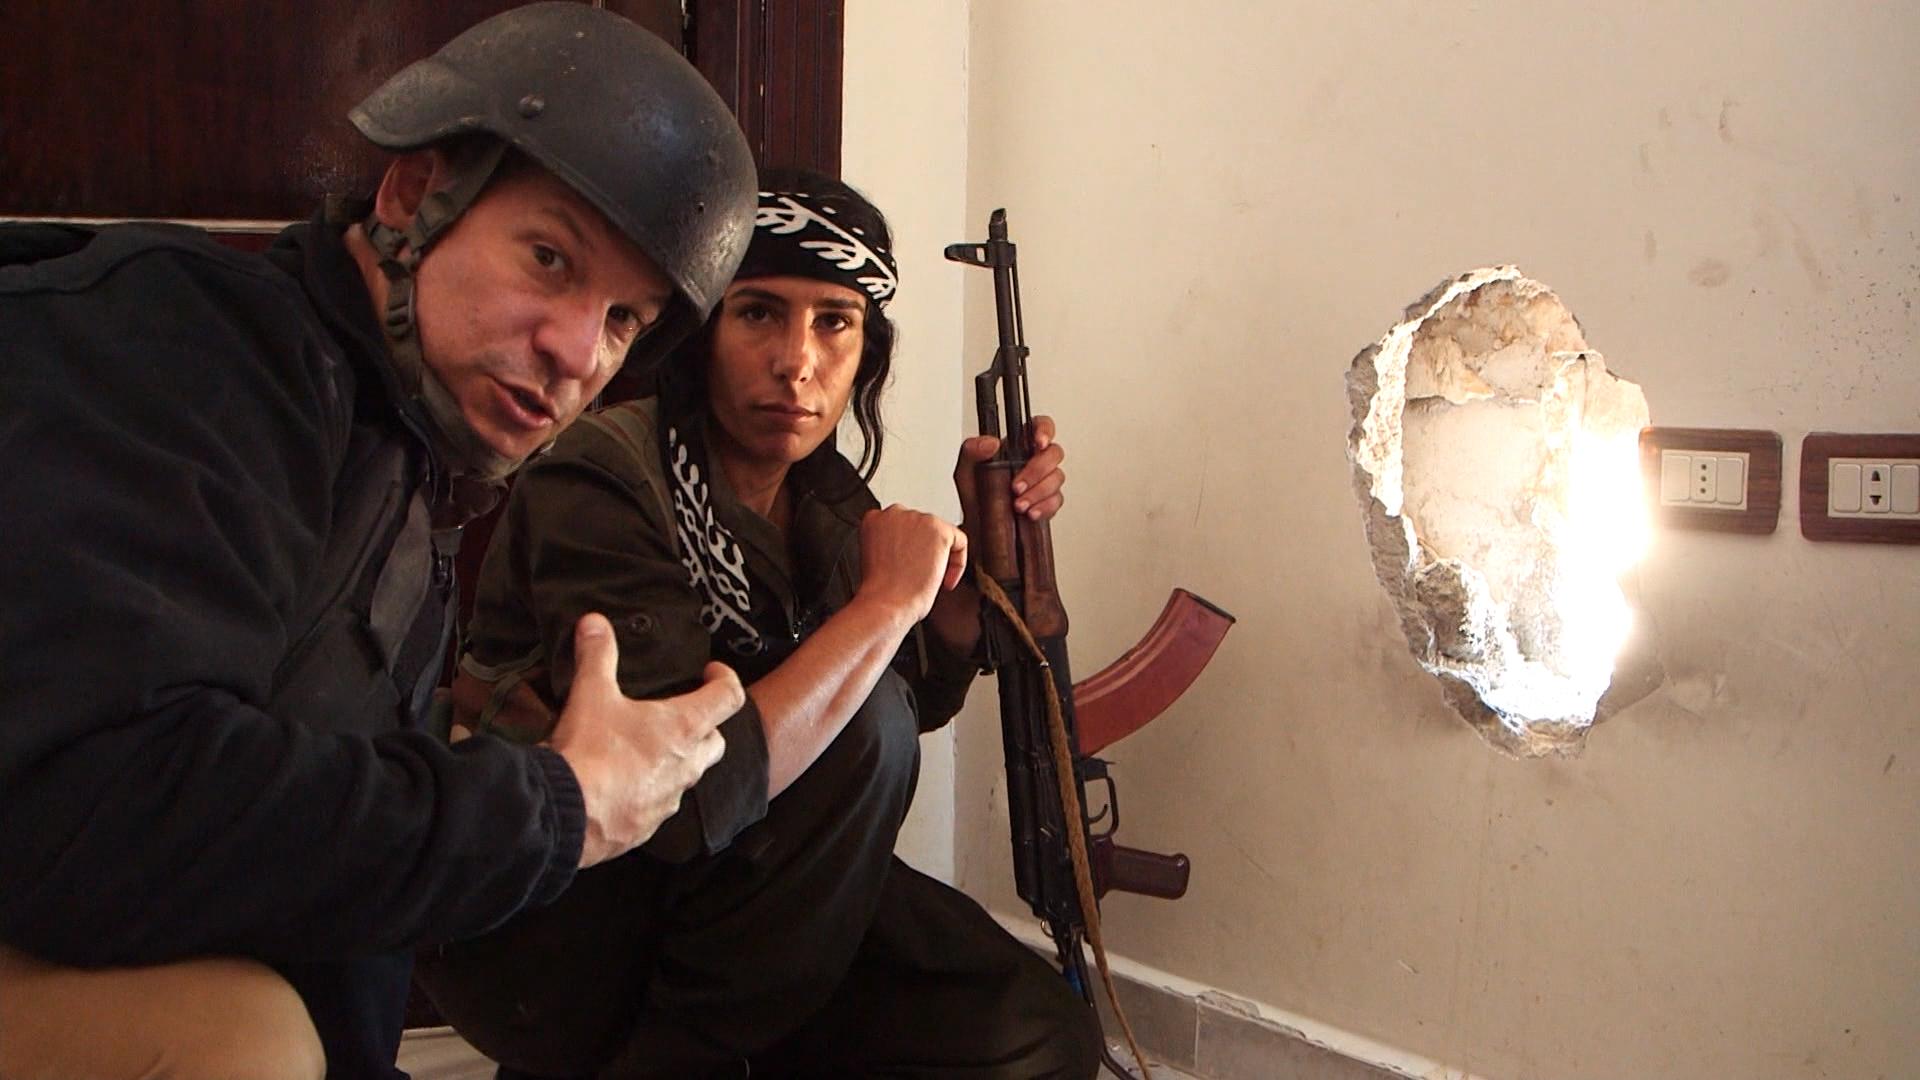 Engel first US correspondent in Kobani